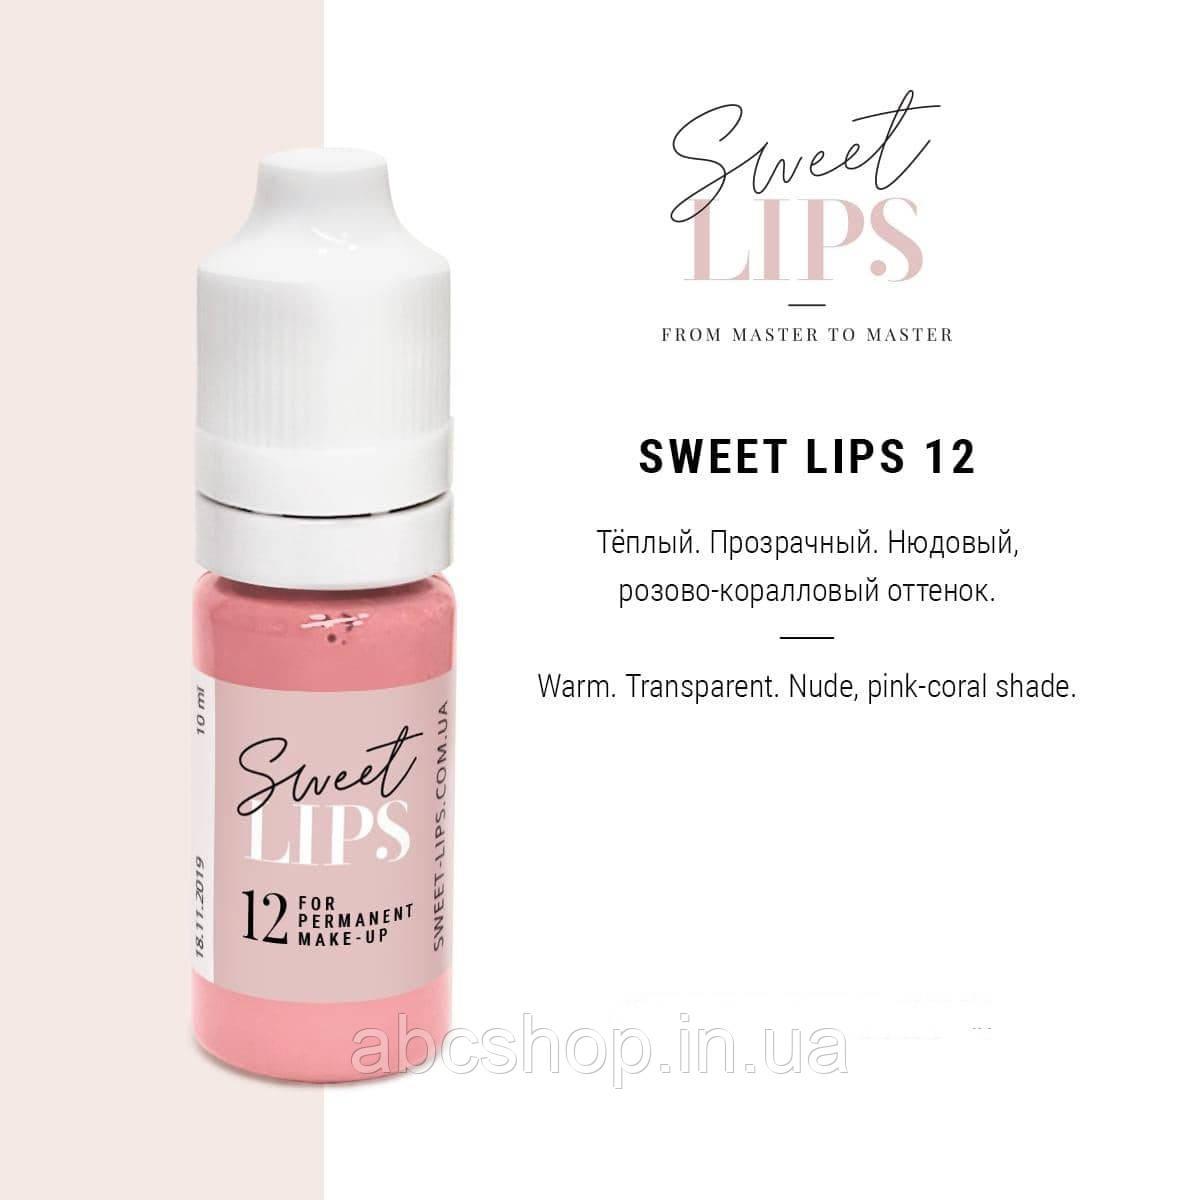 Пигмент Sweet Lips 12 (10мл)